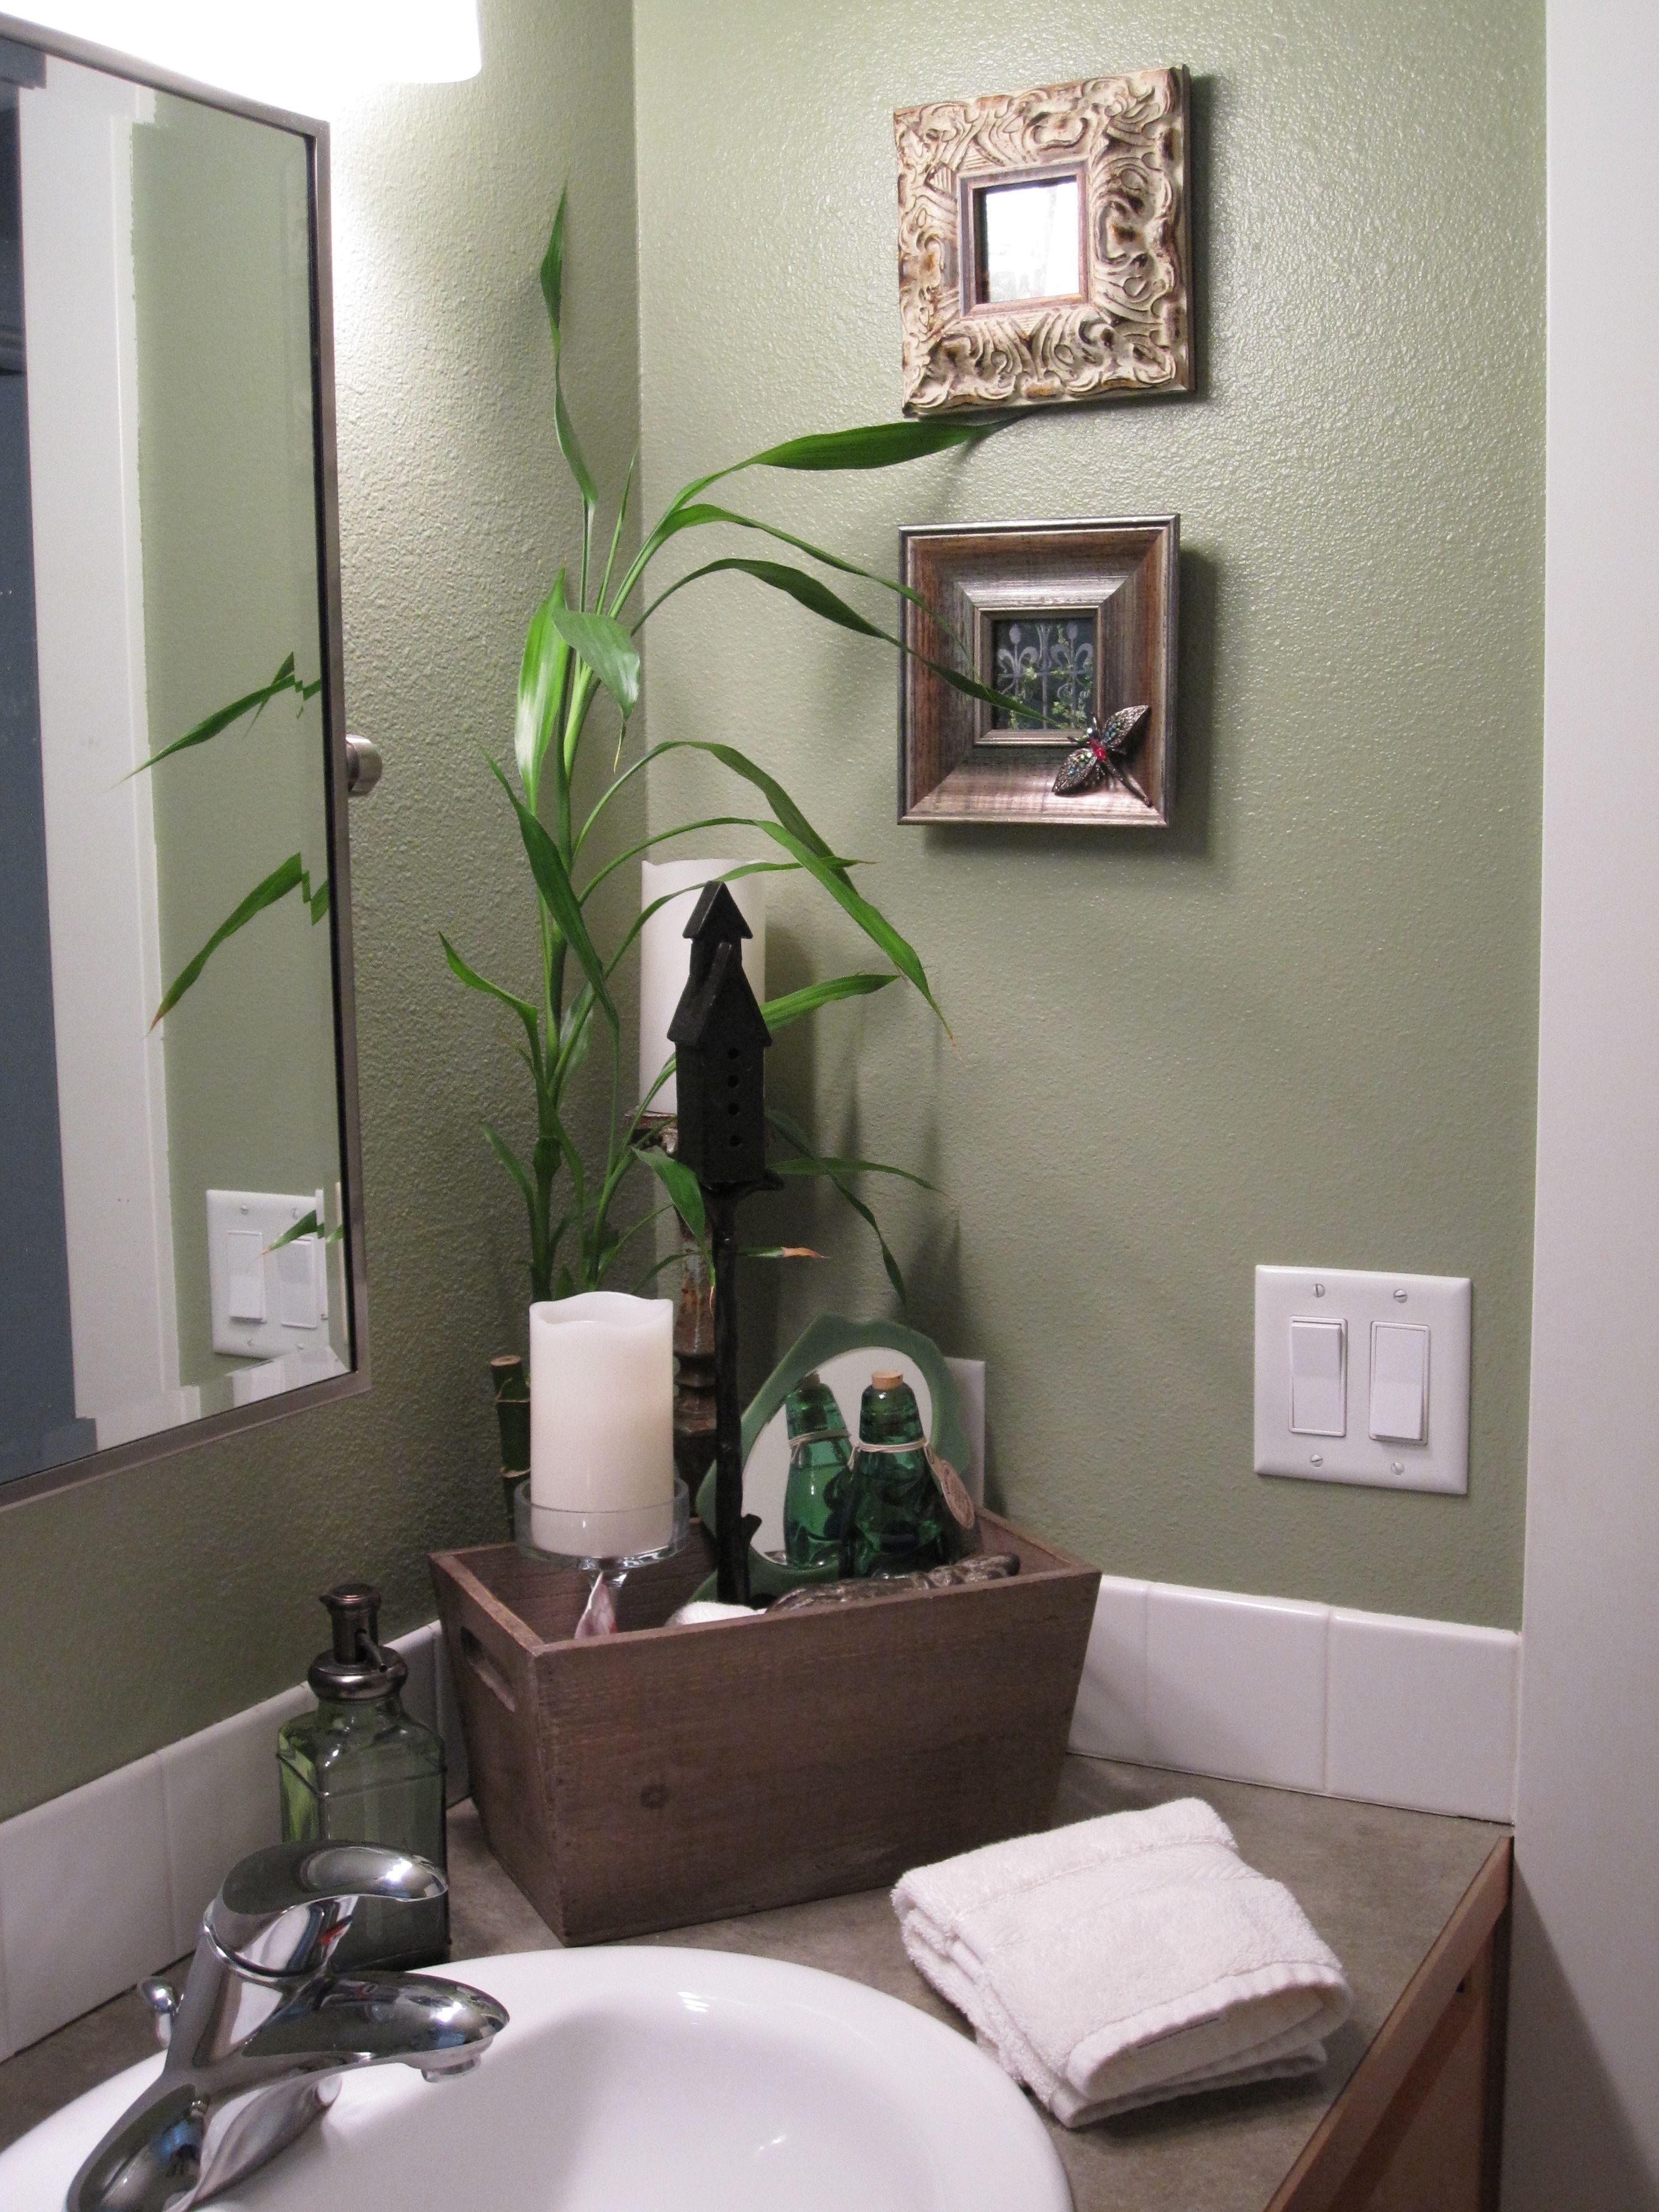 A Simple Guide To Fresh Green Bathroom Ideas Pinterest Ij20k1 Https Ijcar 2016 Info Fresh Green Bath Green Bathroom Decor Green Bathroom Bathroom Wall Colors